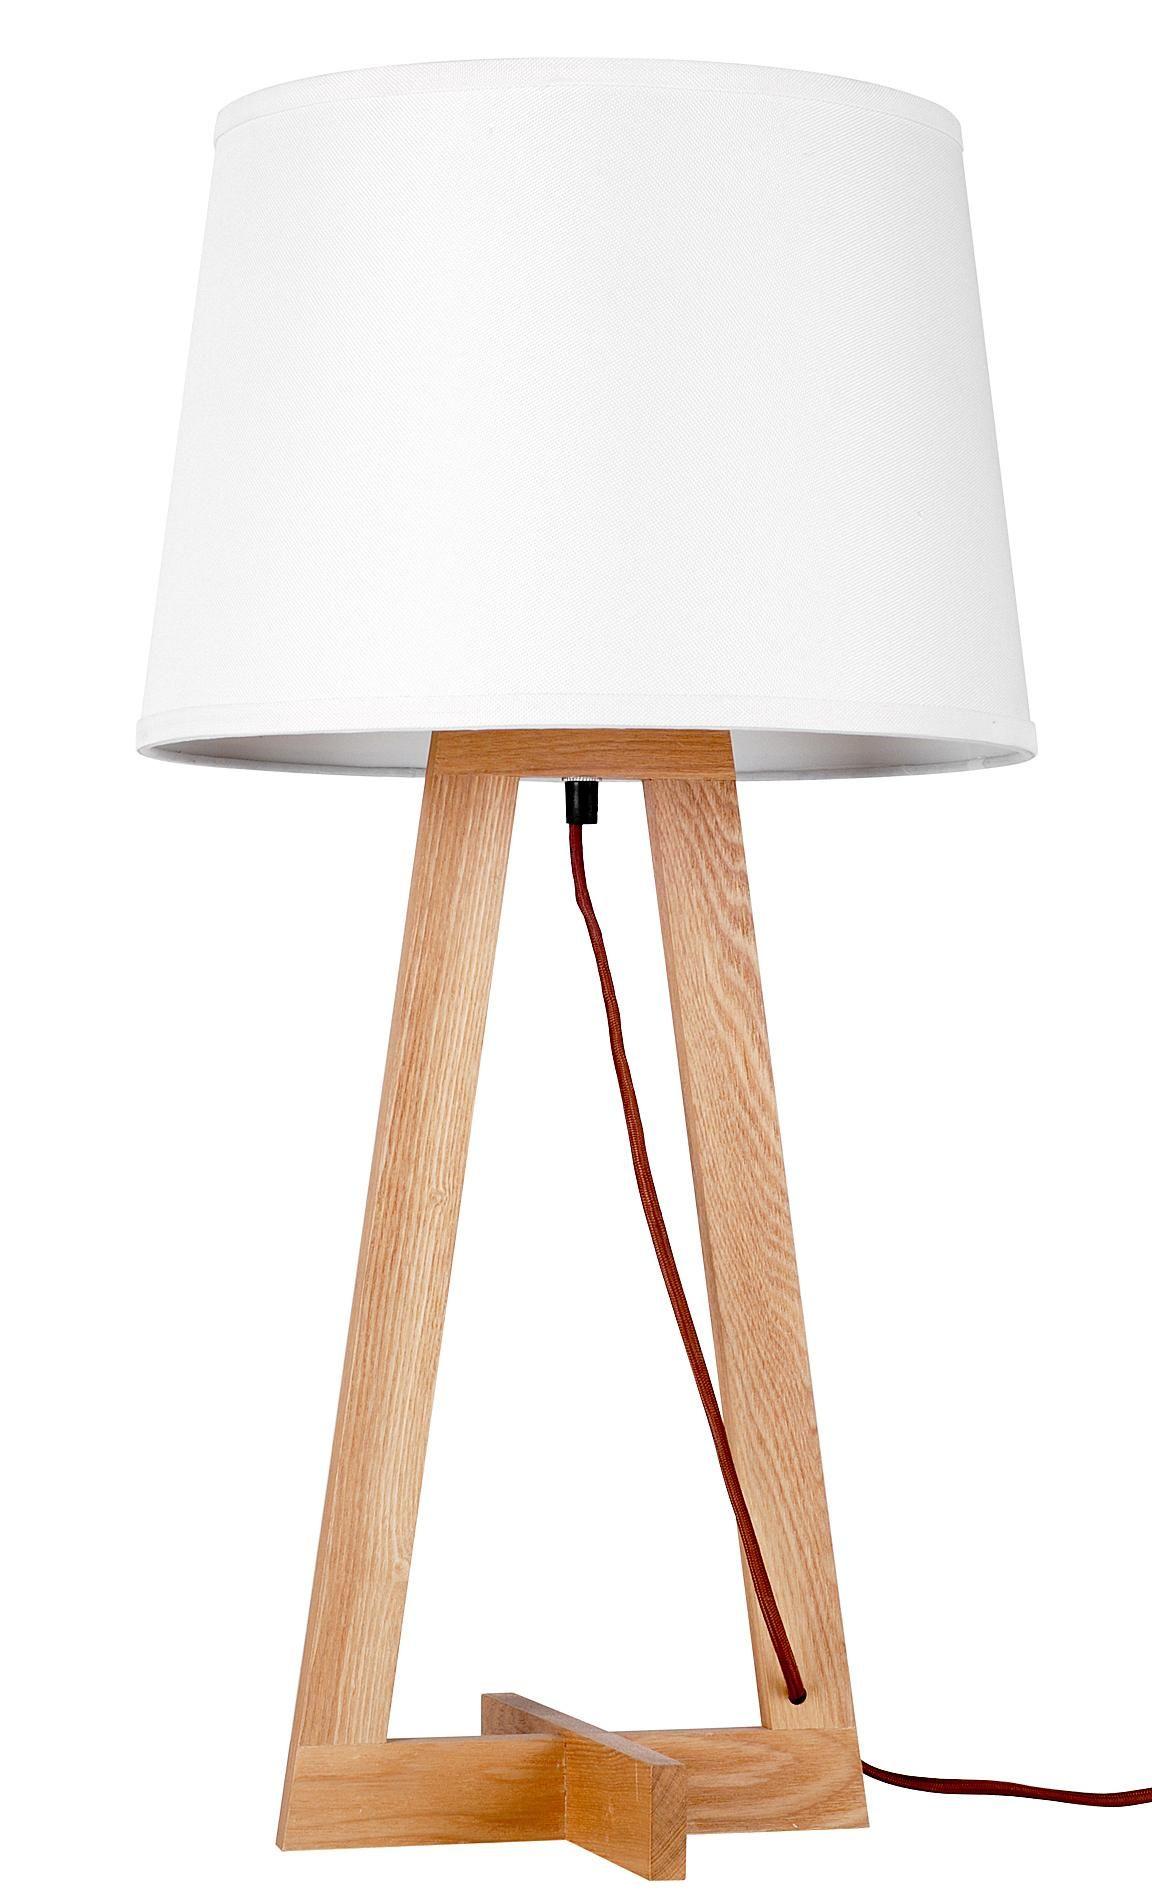 Lamp product,table lamp ,desk lamp,modern table lamp,wooden table ... for Modern Wooden Desk Lamps  287fsj